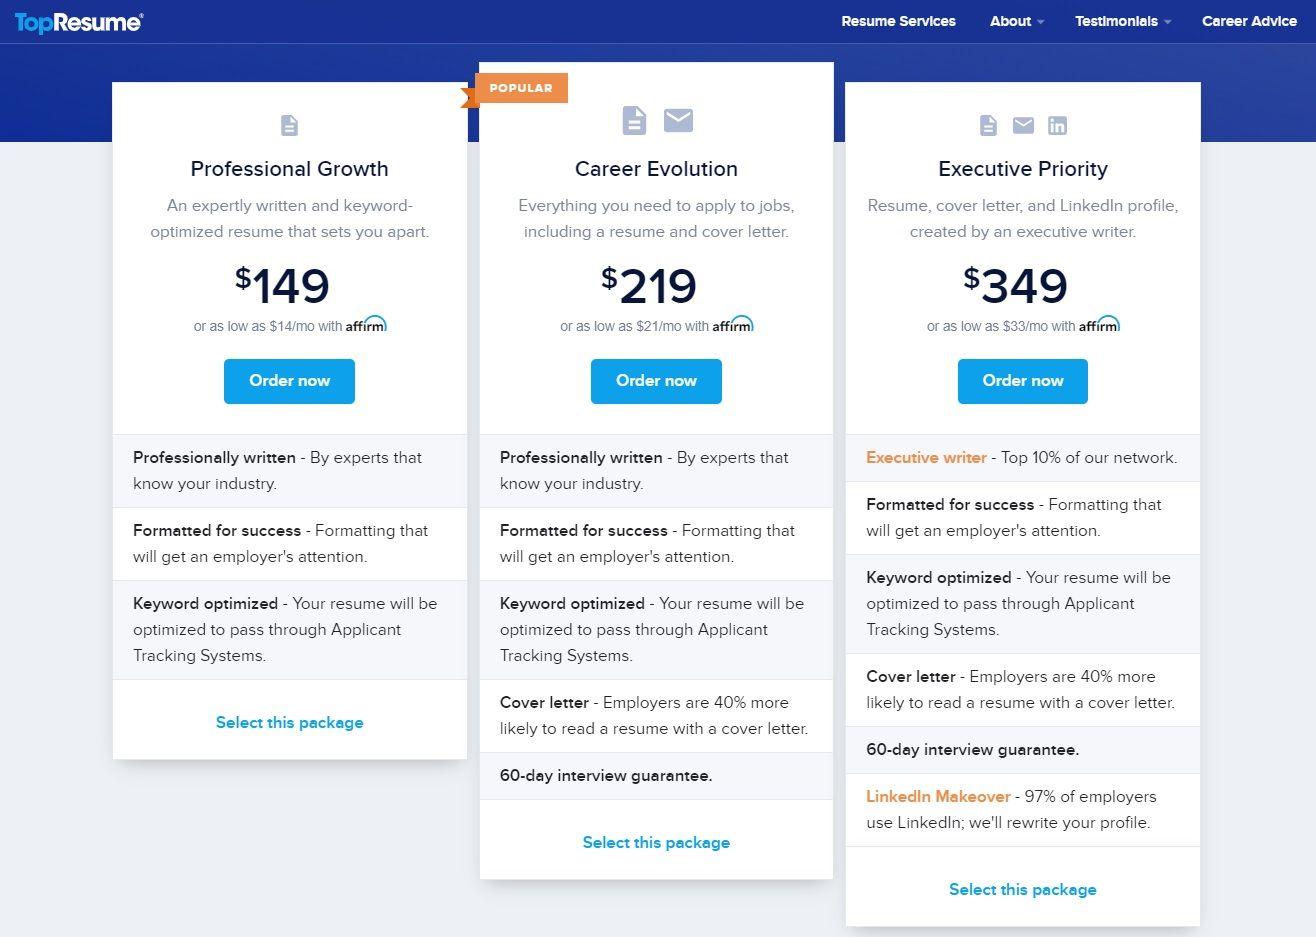 TopResume Pricing & Packages